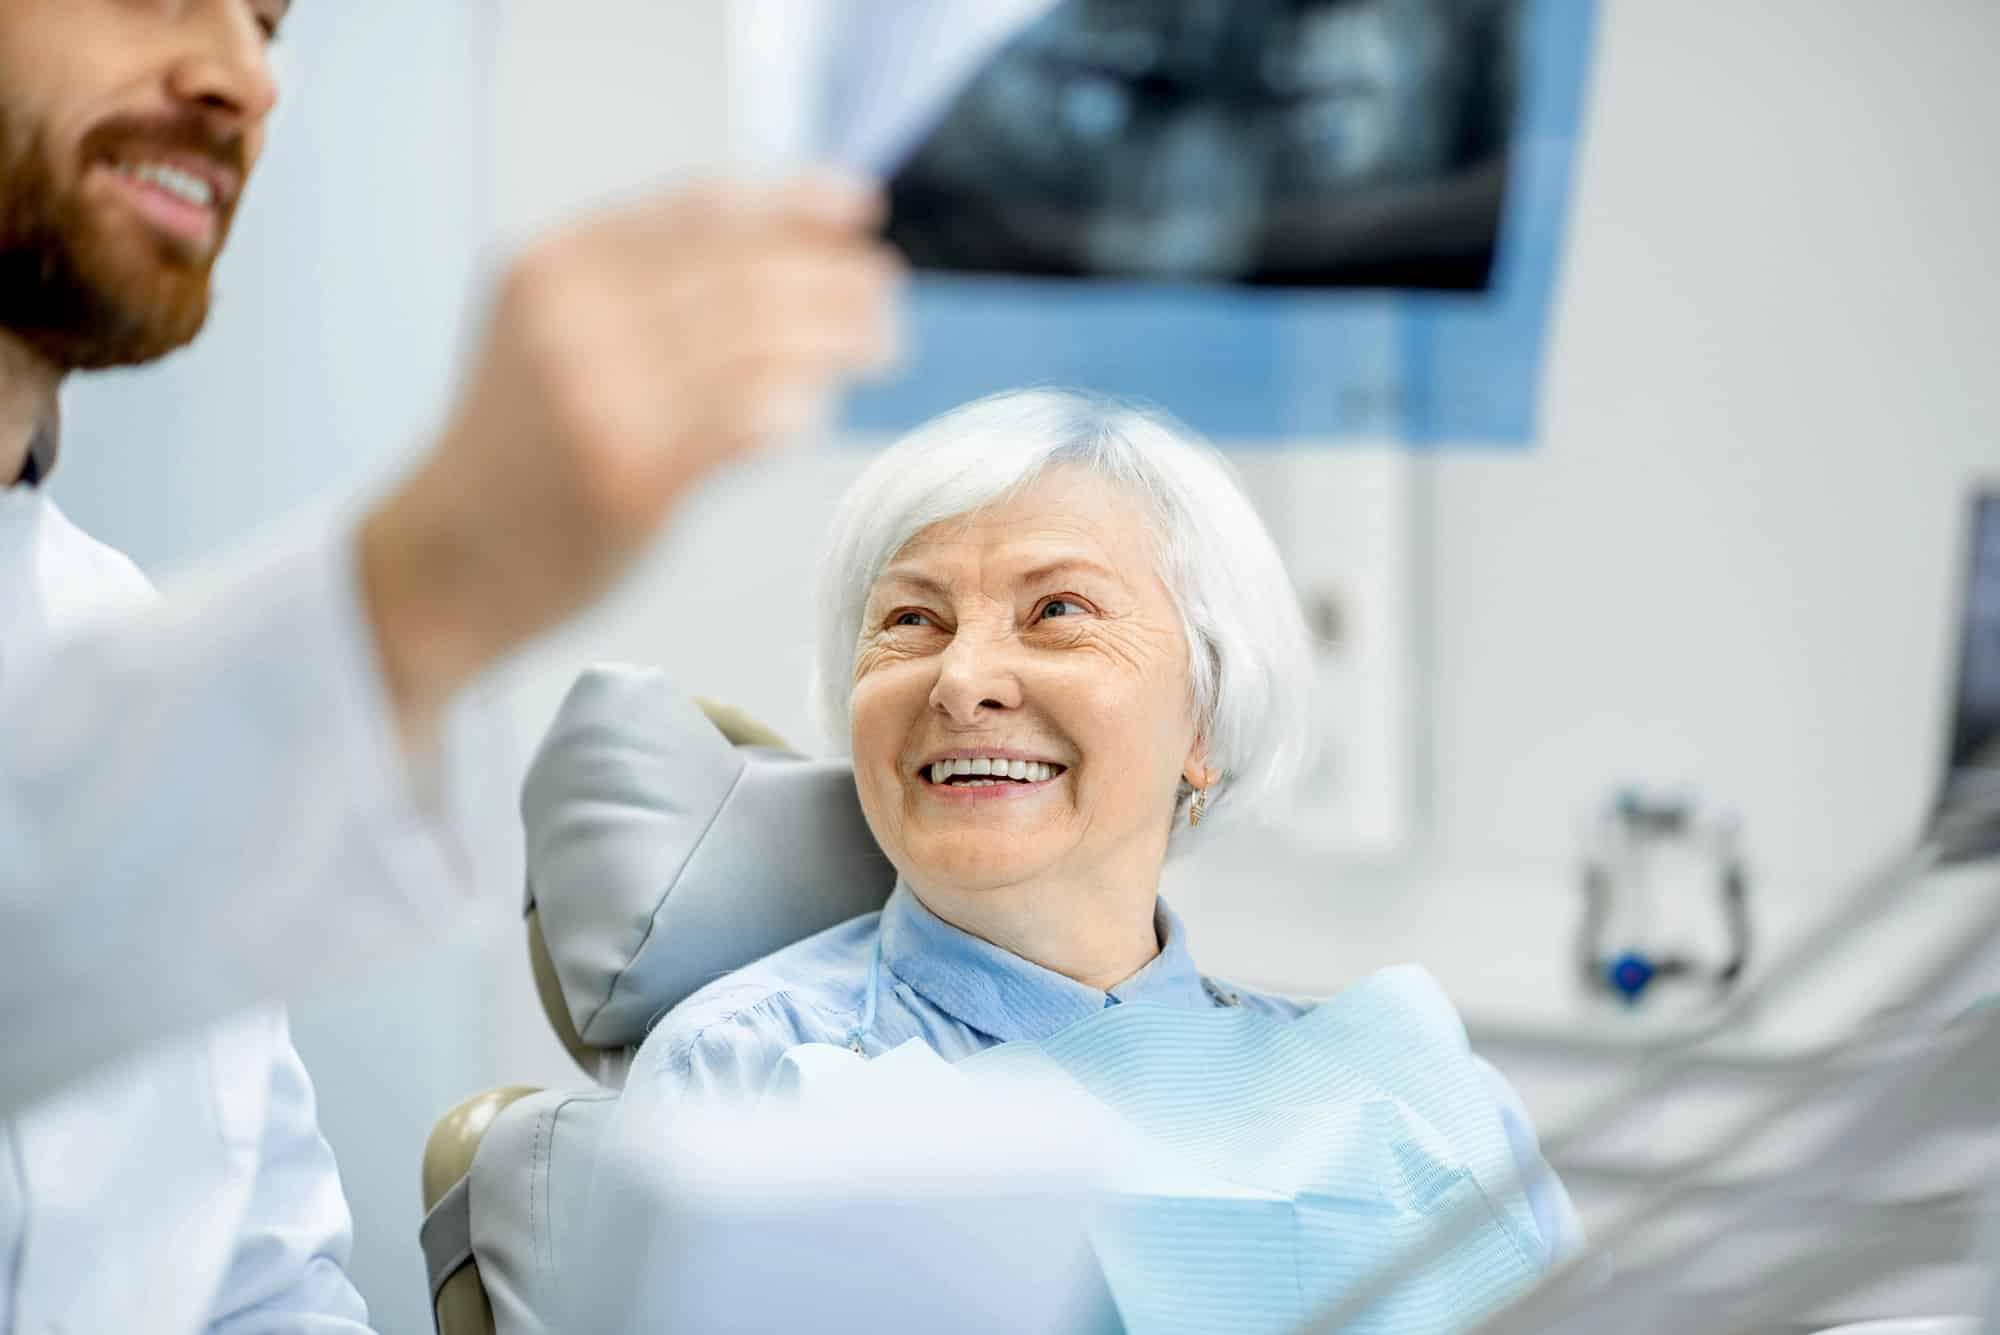 Seniorenmedizin - Dr. Moroni